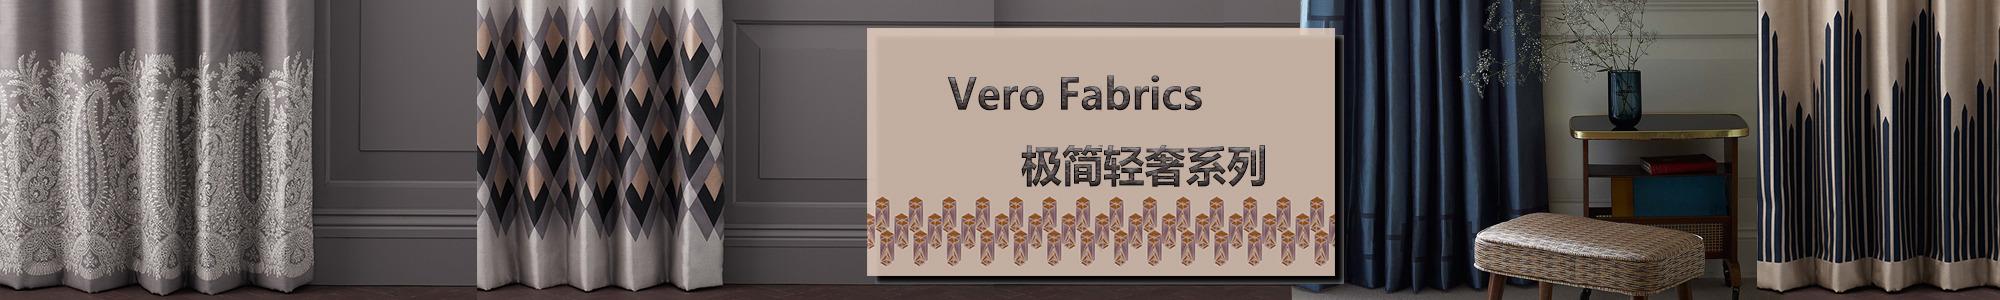 Vero Fabrics